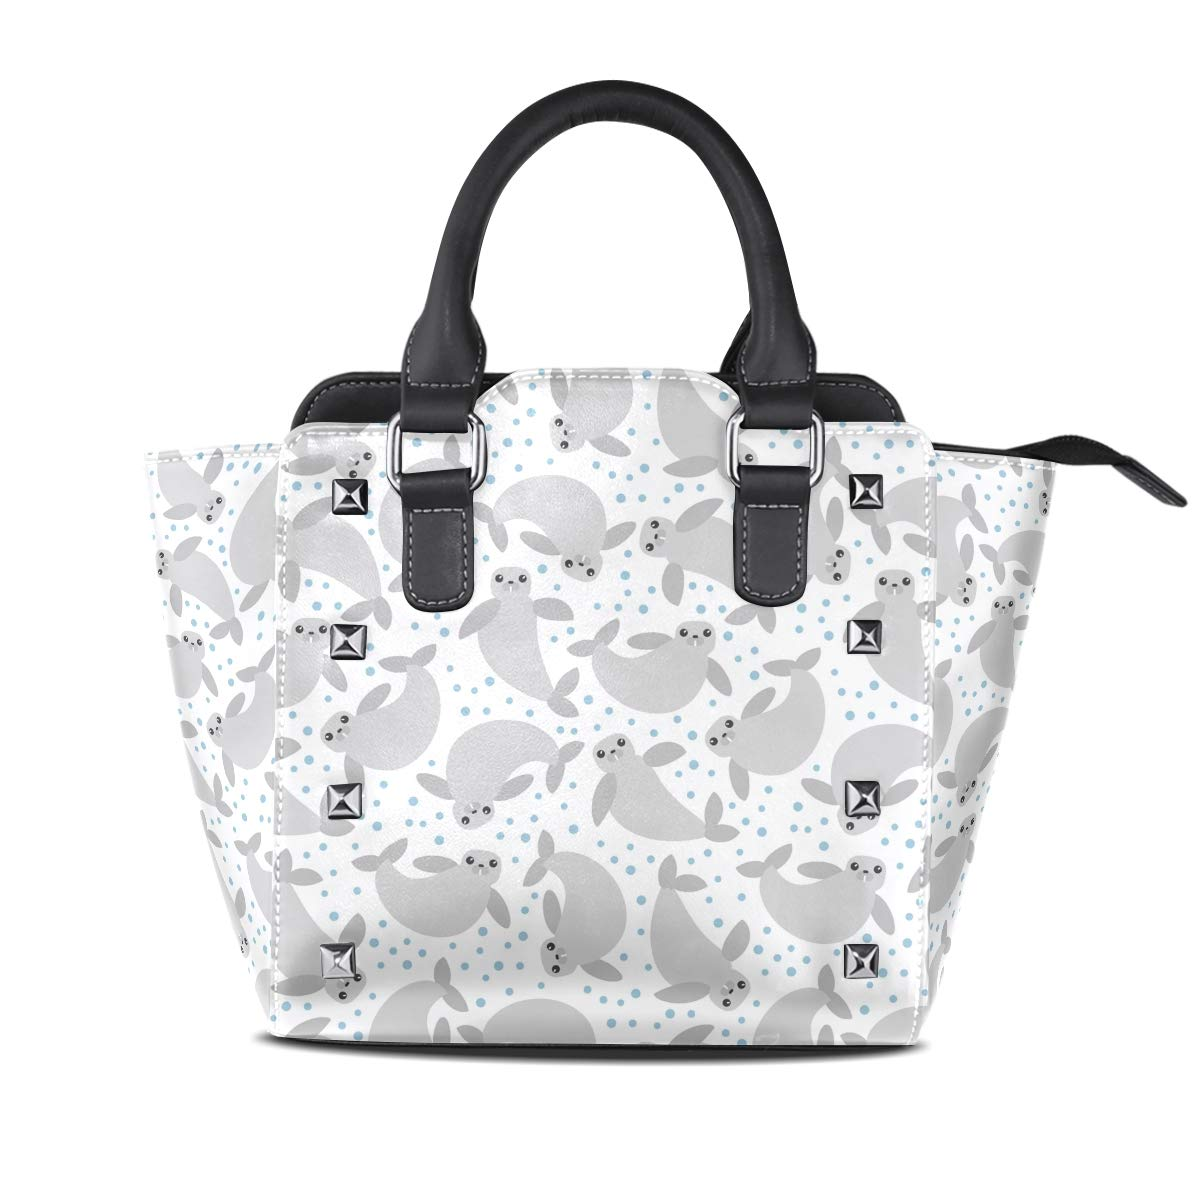 Design4 Handbag Painted Watermelon Genuine Leather Tote Rivet Bag Shoulder Strap Top Handle Women